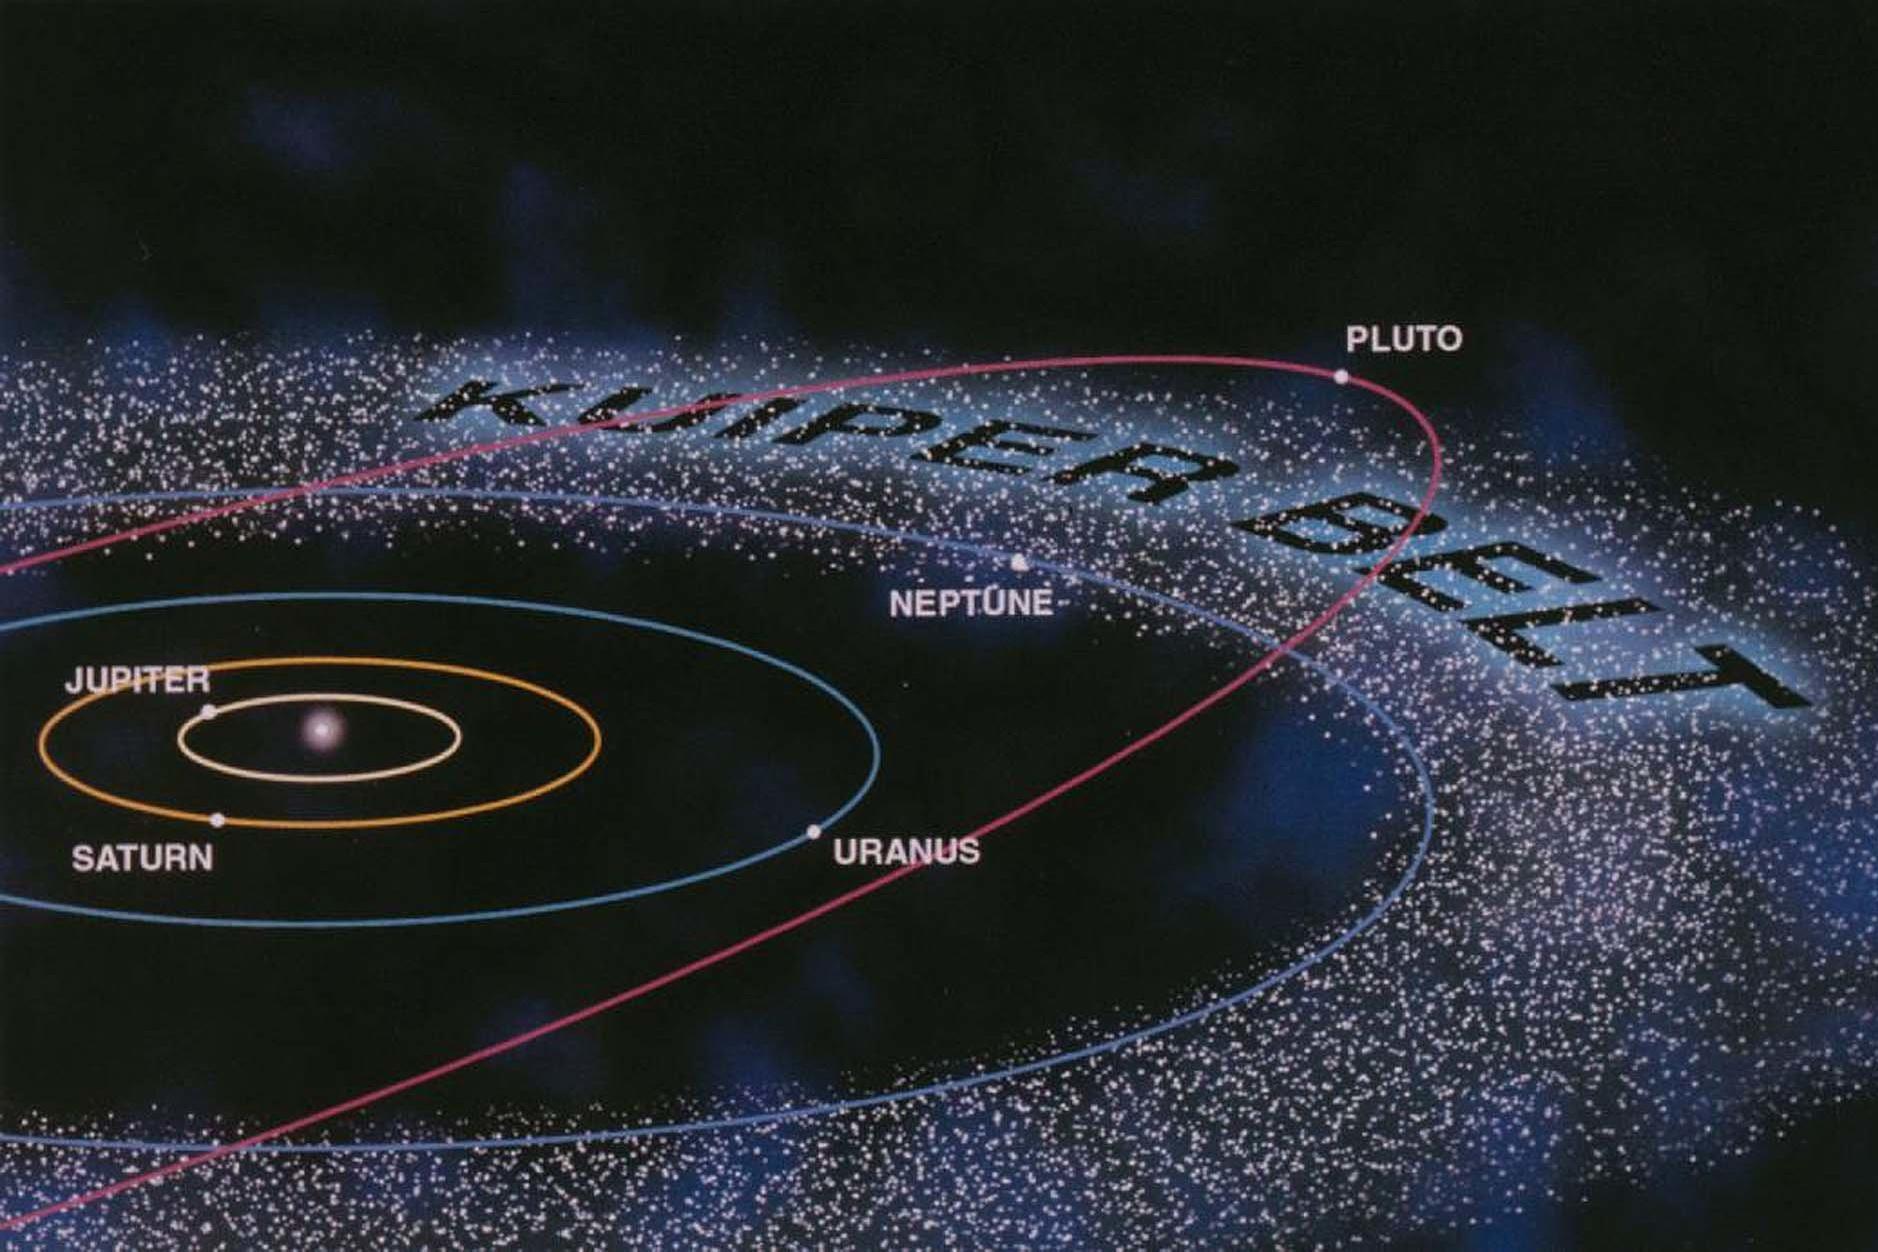 asteroids classification near earth asteroids asteroid belt